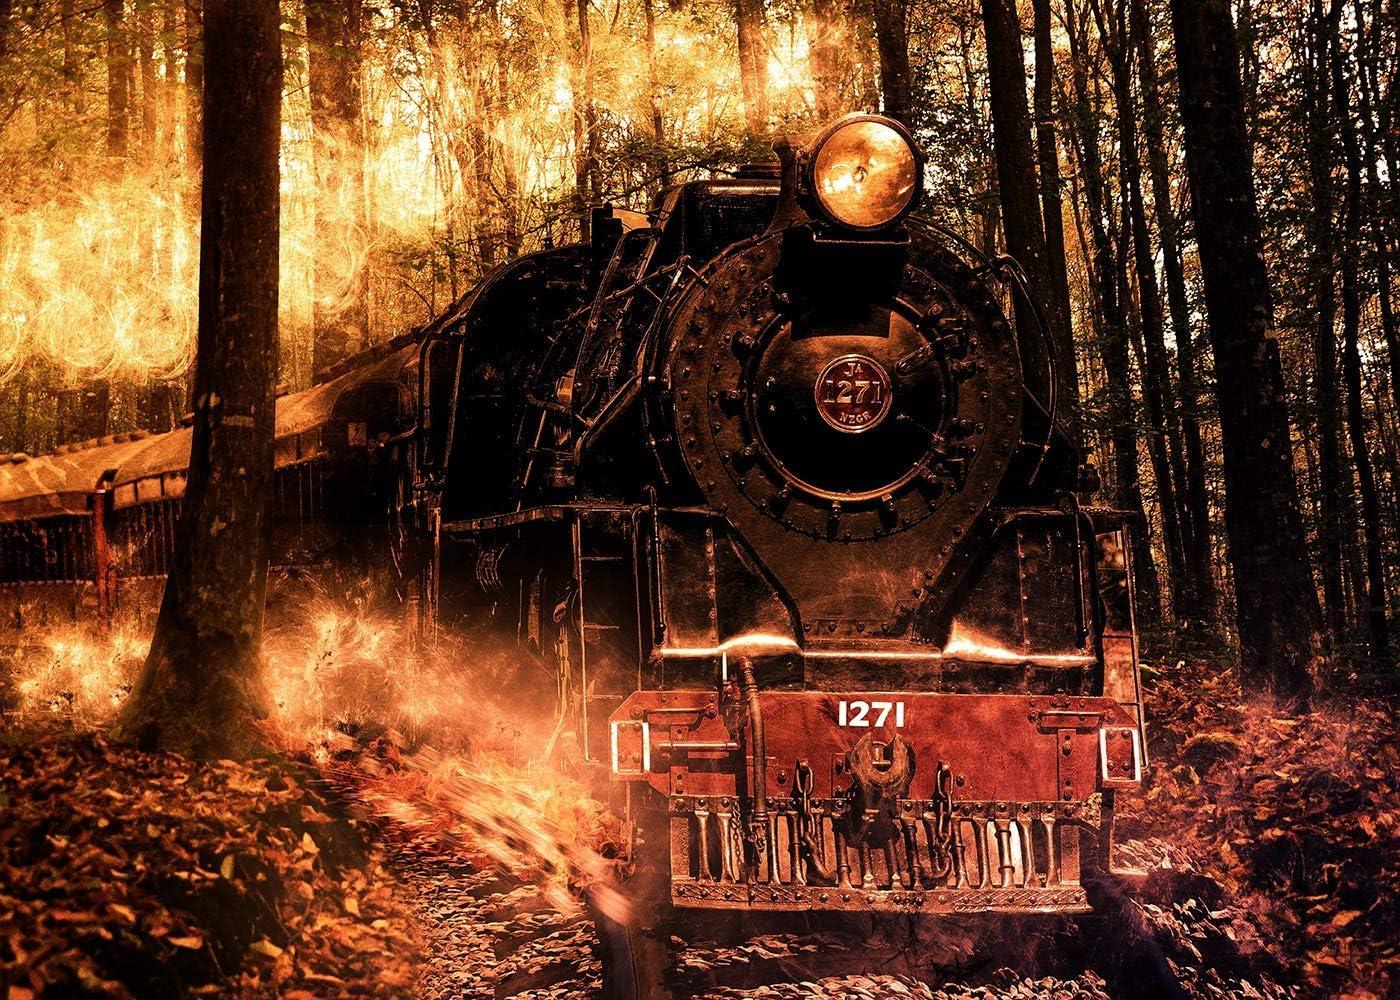 10x8ft Forest Train Background Retro Studio Photography Backdrop Photo Props DSFU147